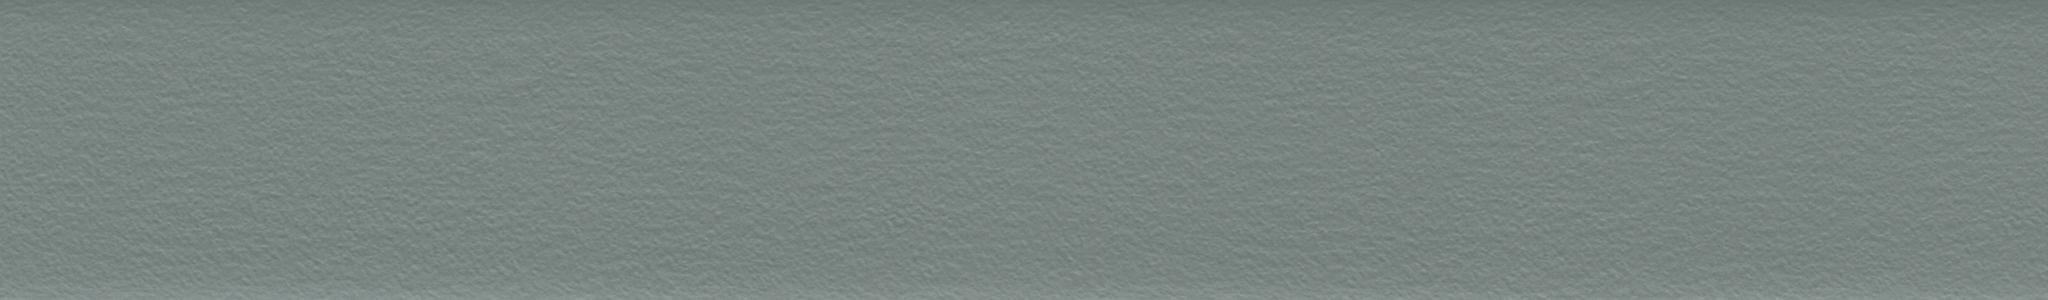 HU 177912 кромка ABS серая жемчуг тонкая структура 107